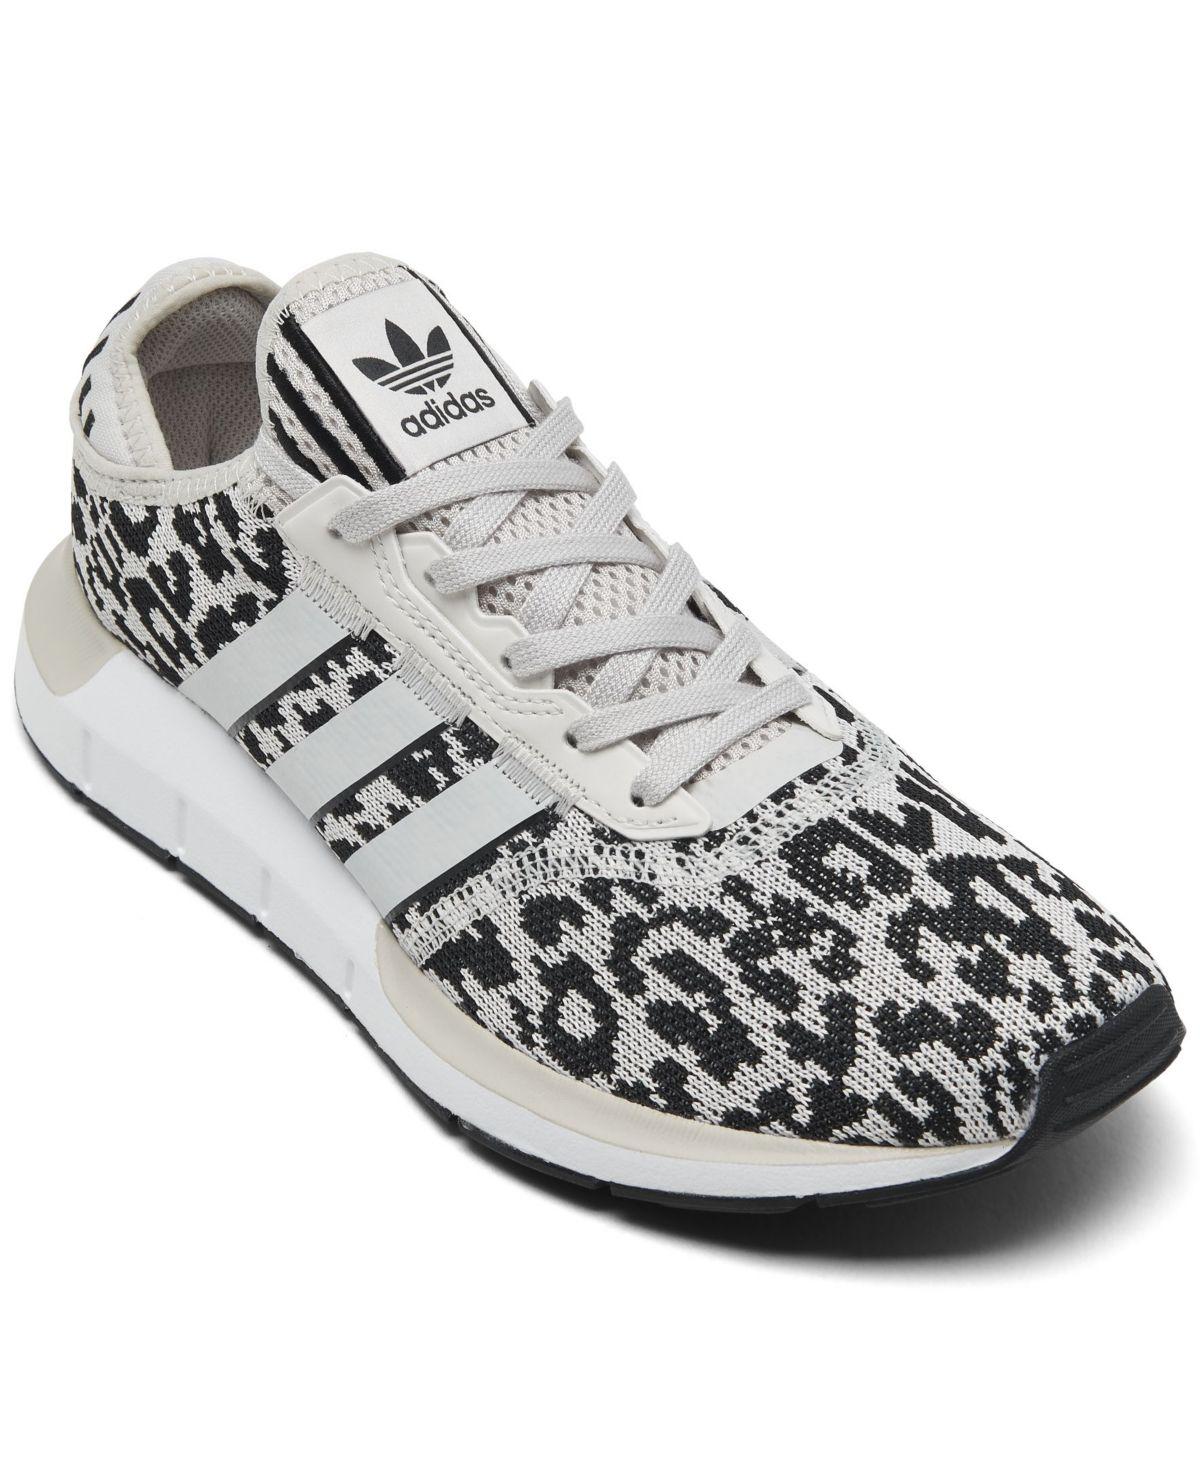 Casual sneakers, Adidas sneakers